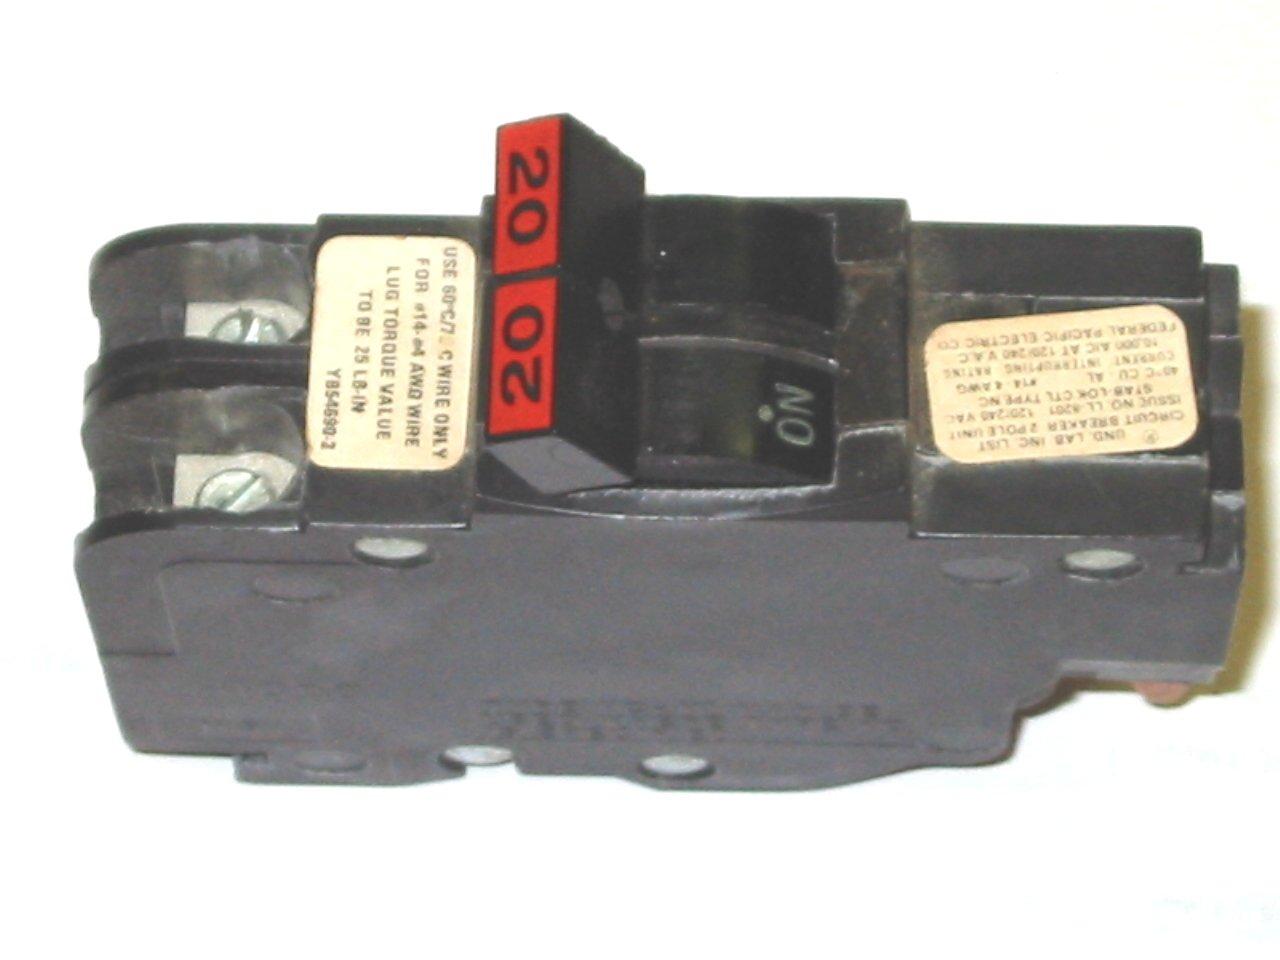 Federal Pacific Fuse Box Parts Wiring Diagrams 100 Amp In Breaker Farmtrac 60 Diagram Block